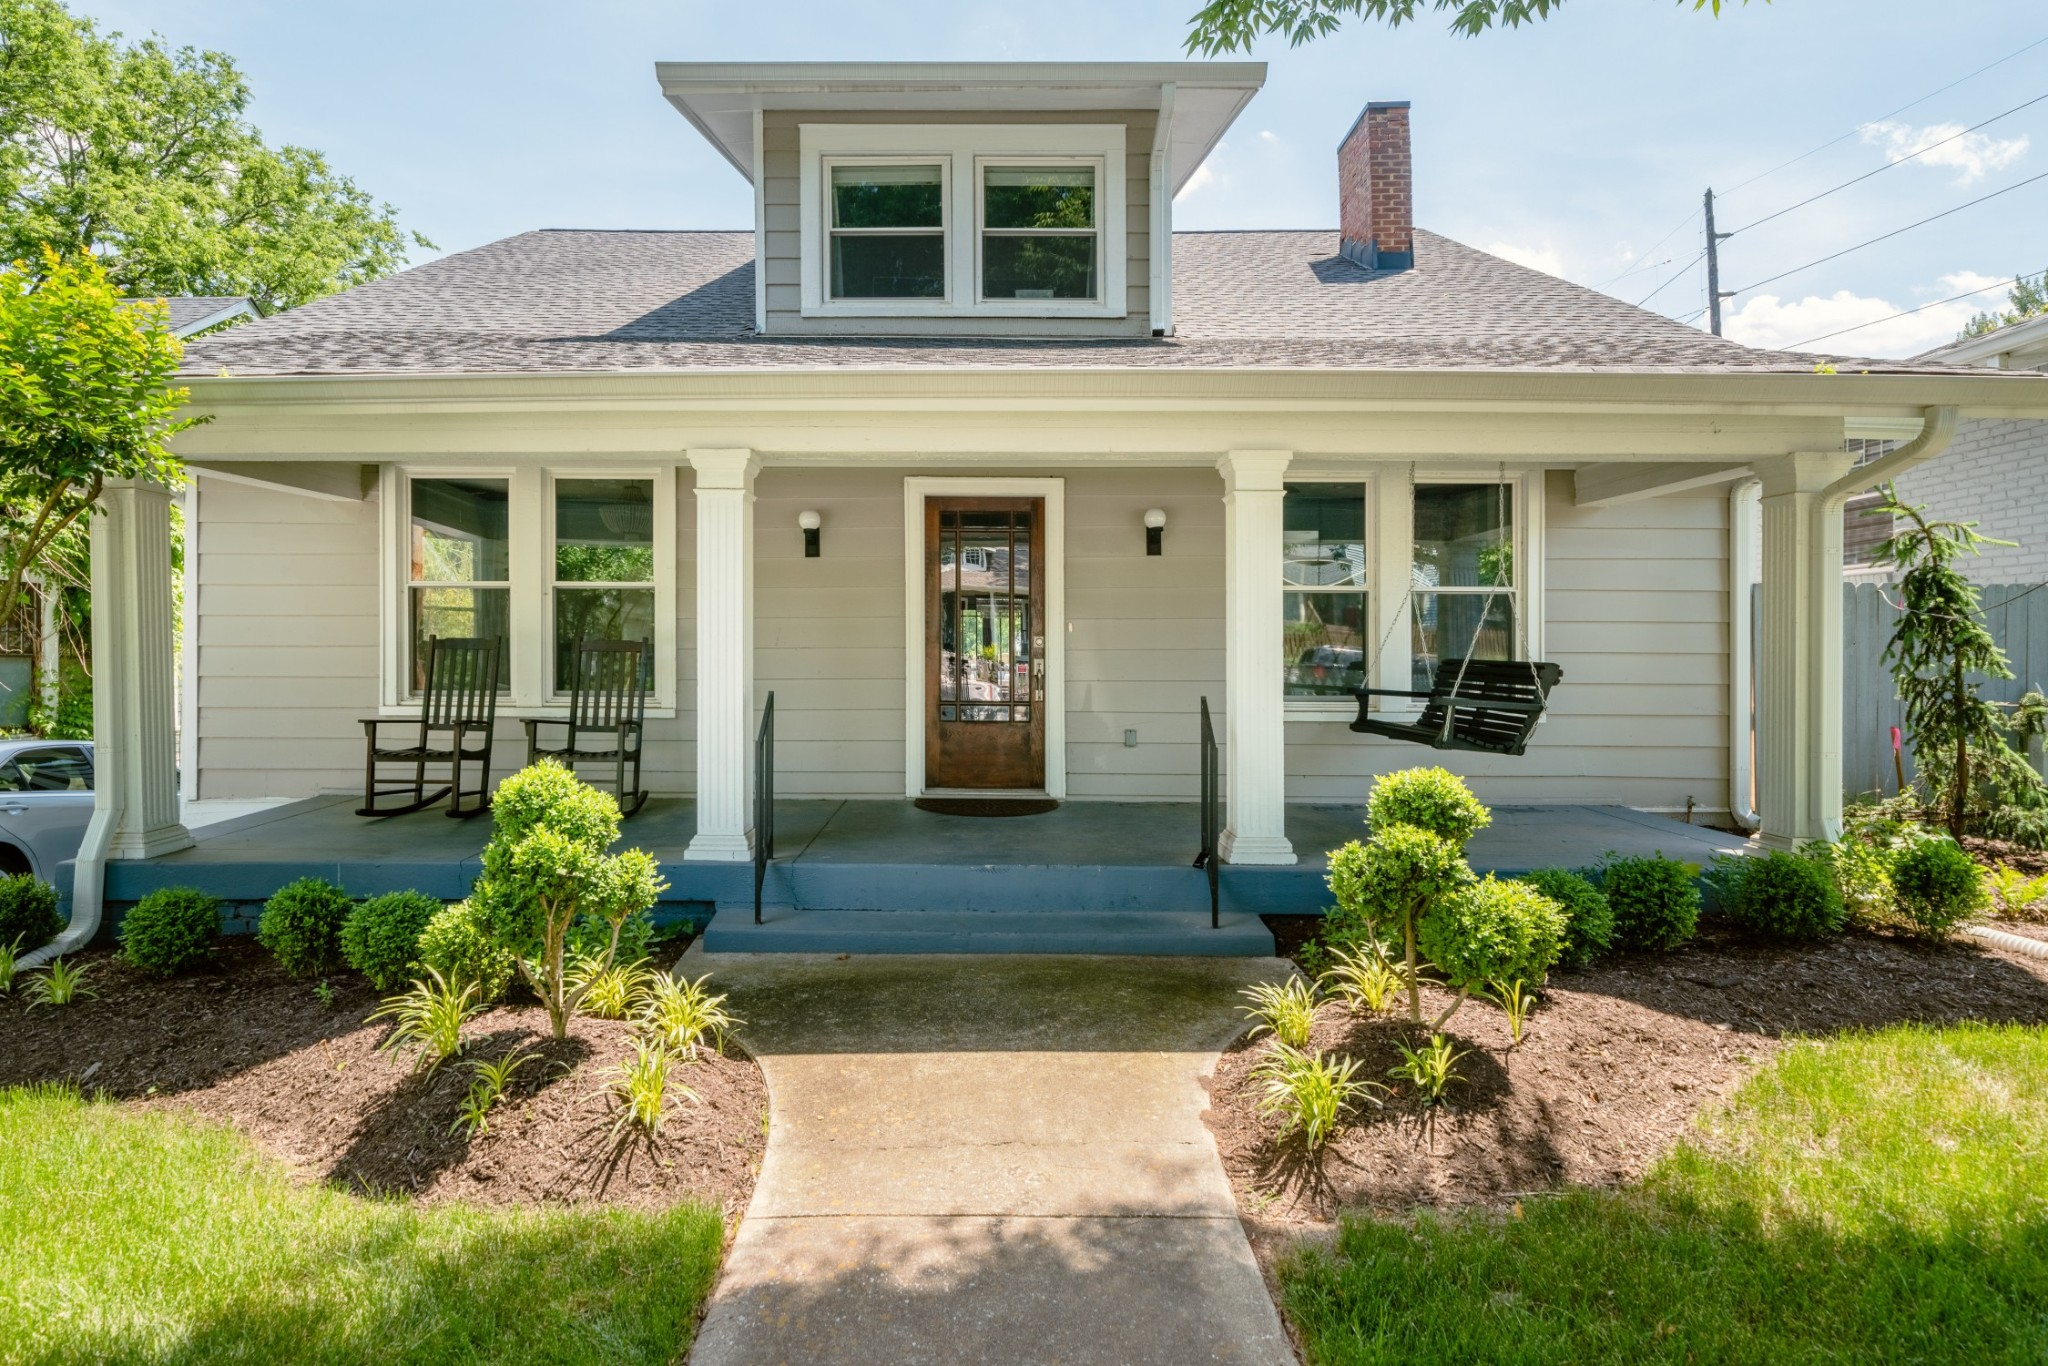 1204 Shelby Ave, Nashville, TN 37206 - Nashville, TN real estate listing